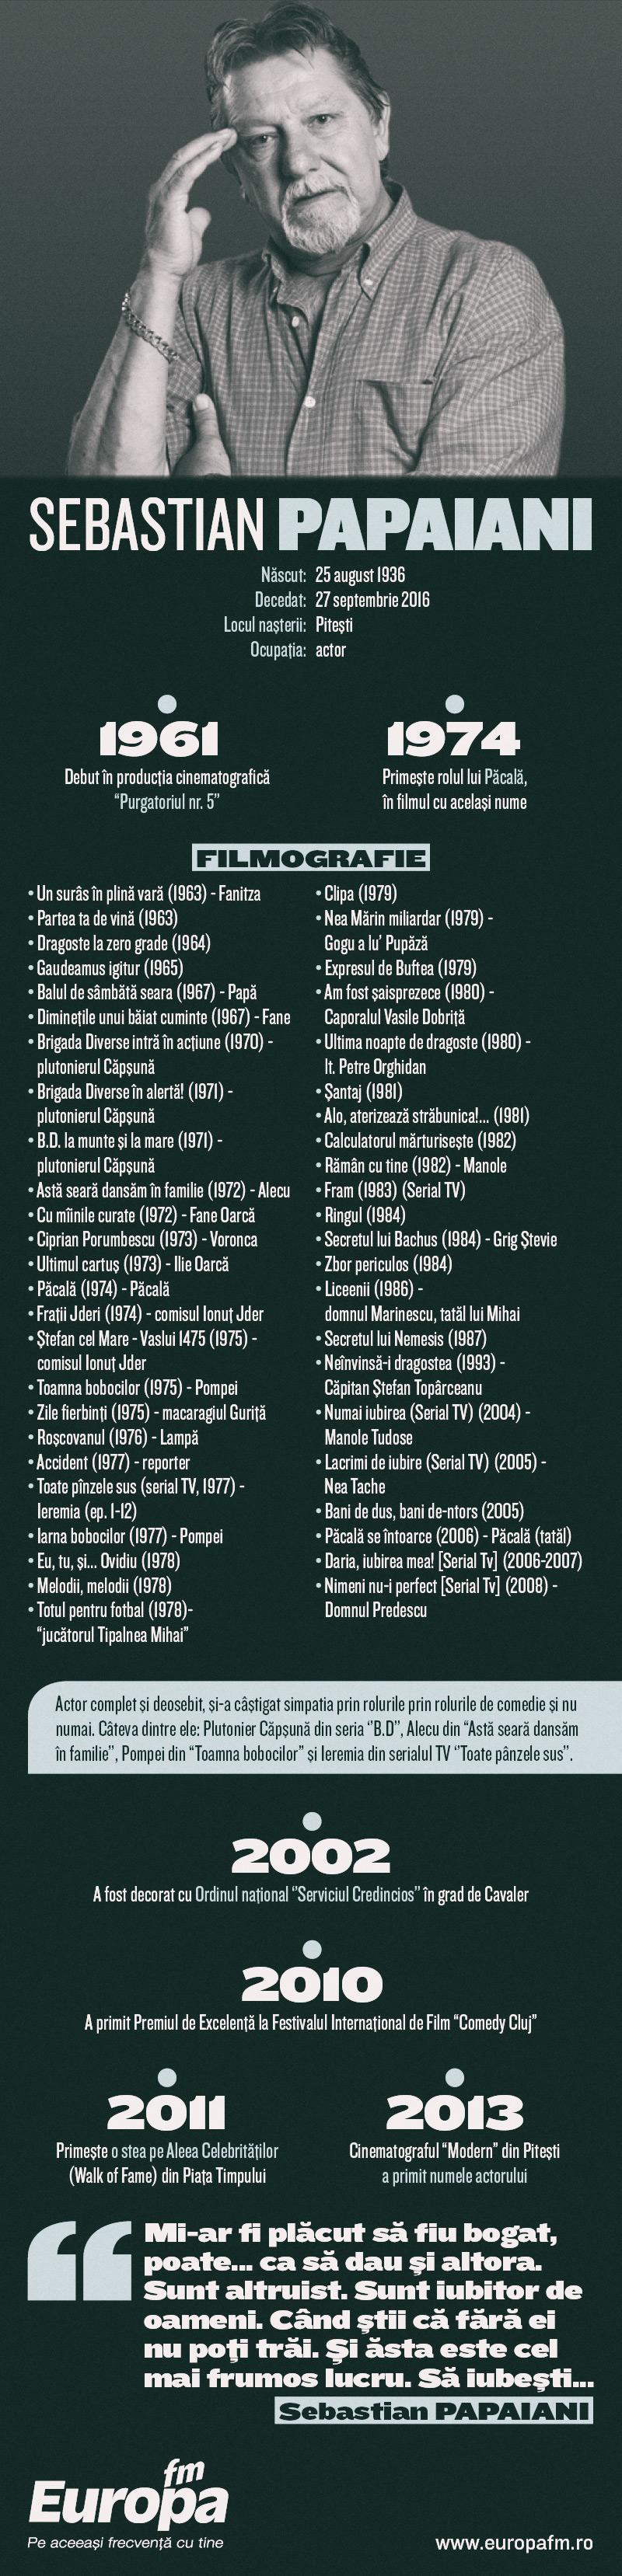 infografic-sebastian-papaiani